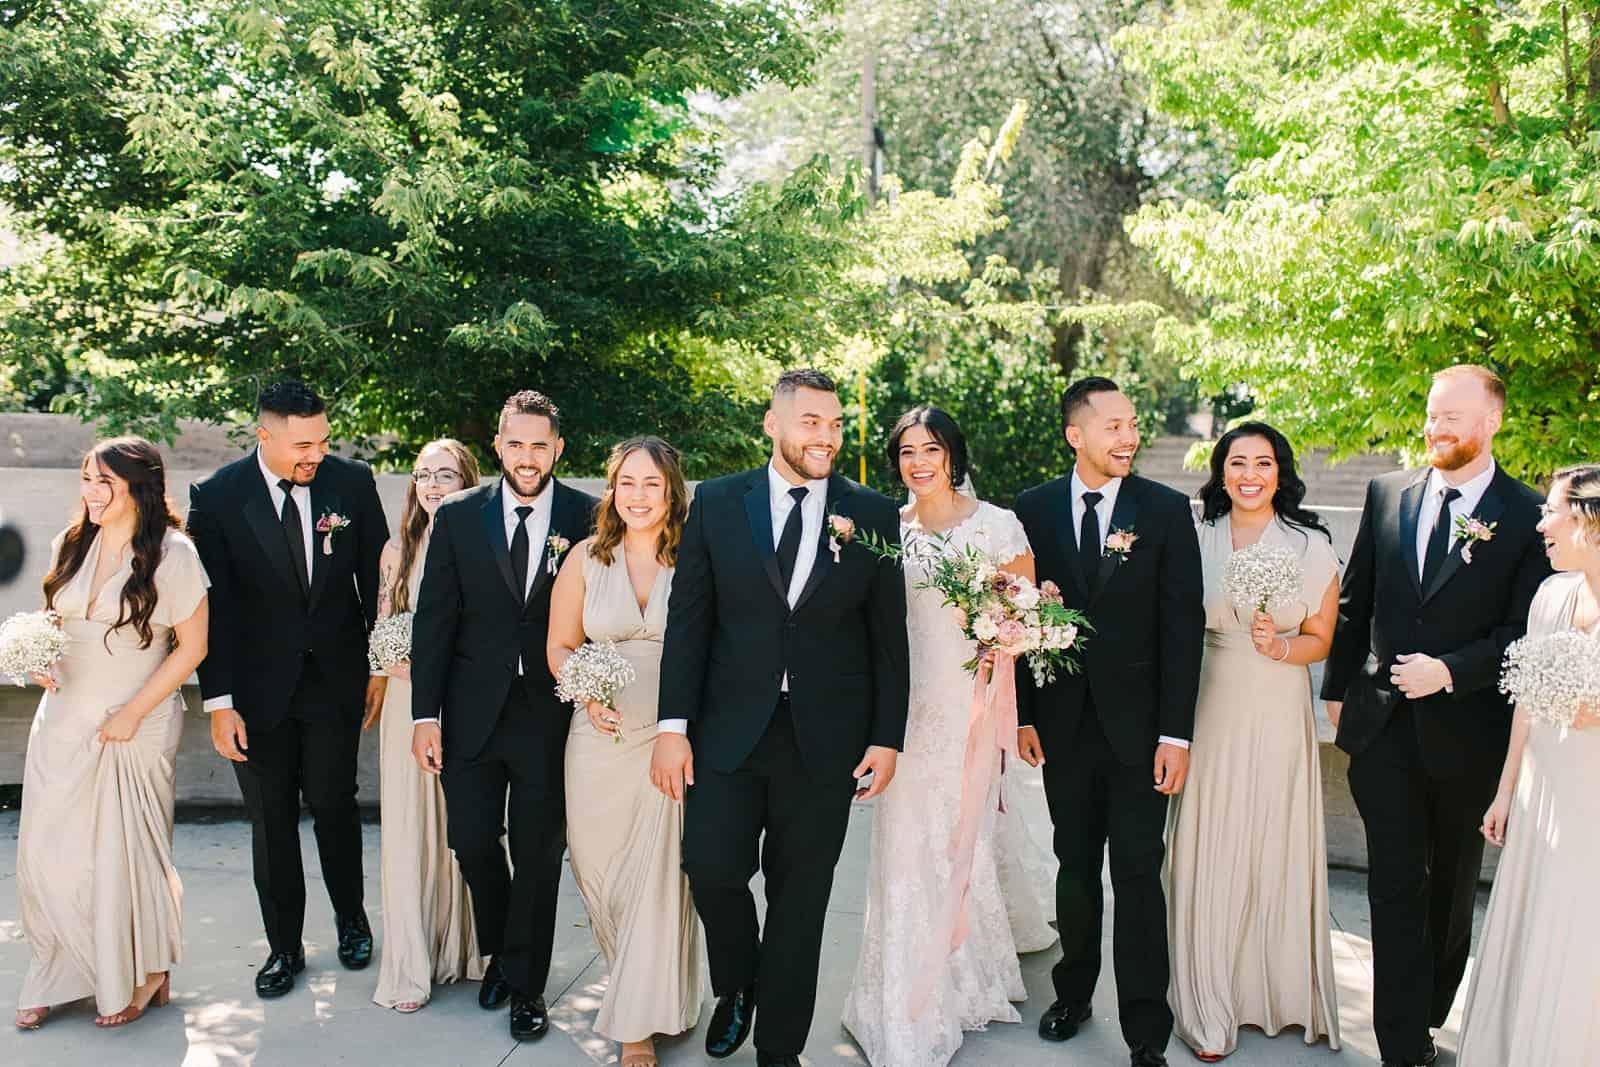 Bride and groom with bridal party in Utah wedding